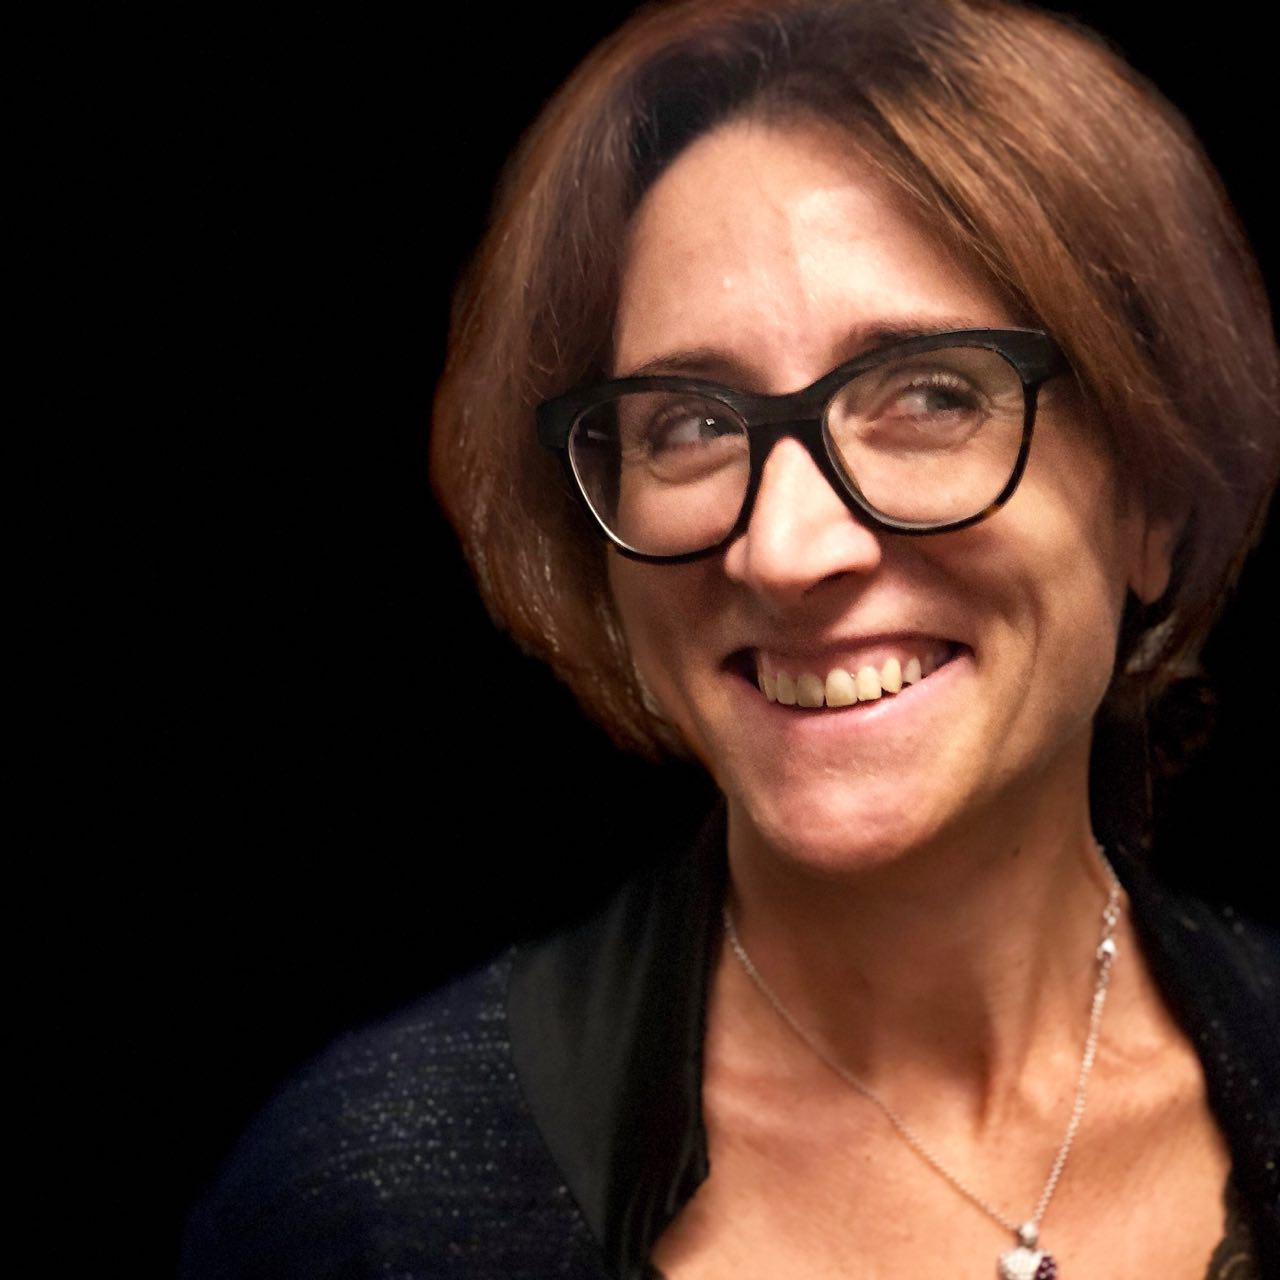 Simona Marcosignori